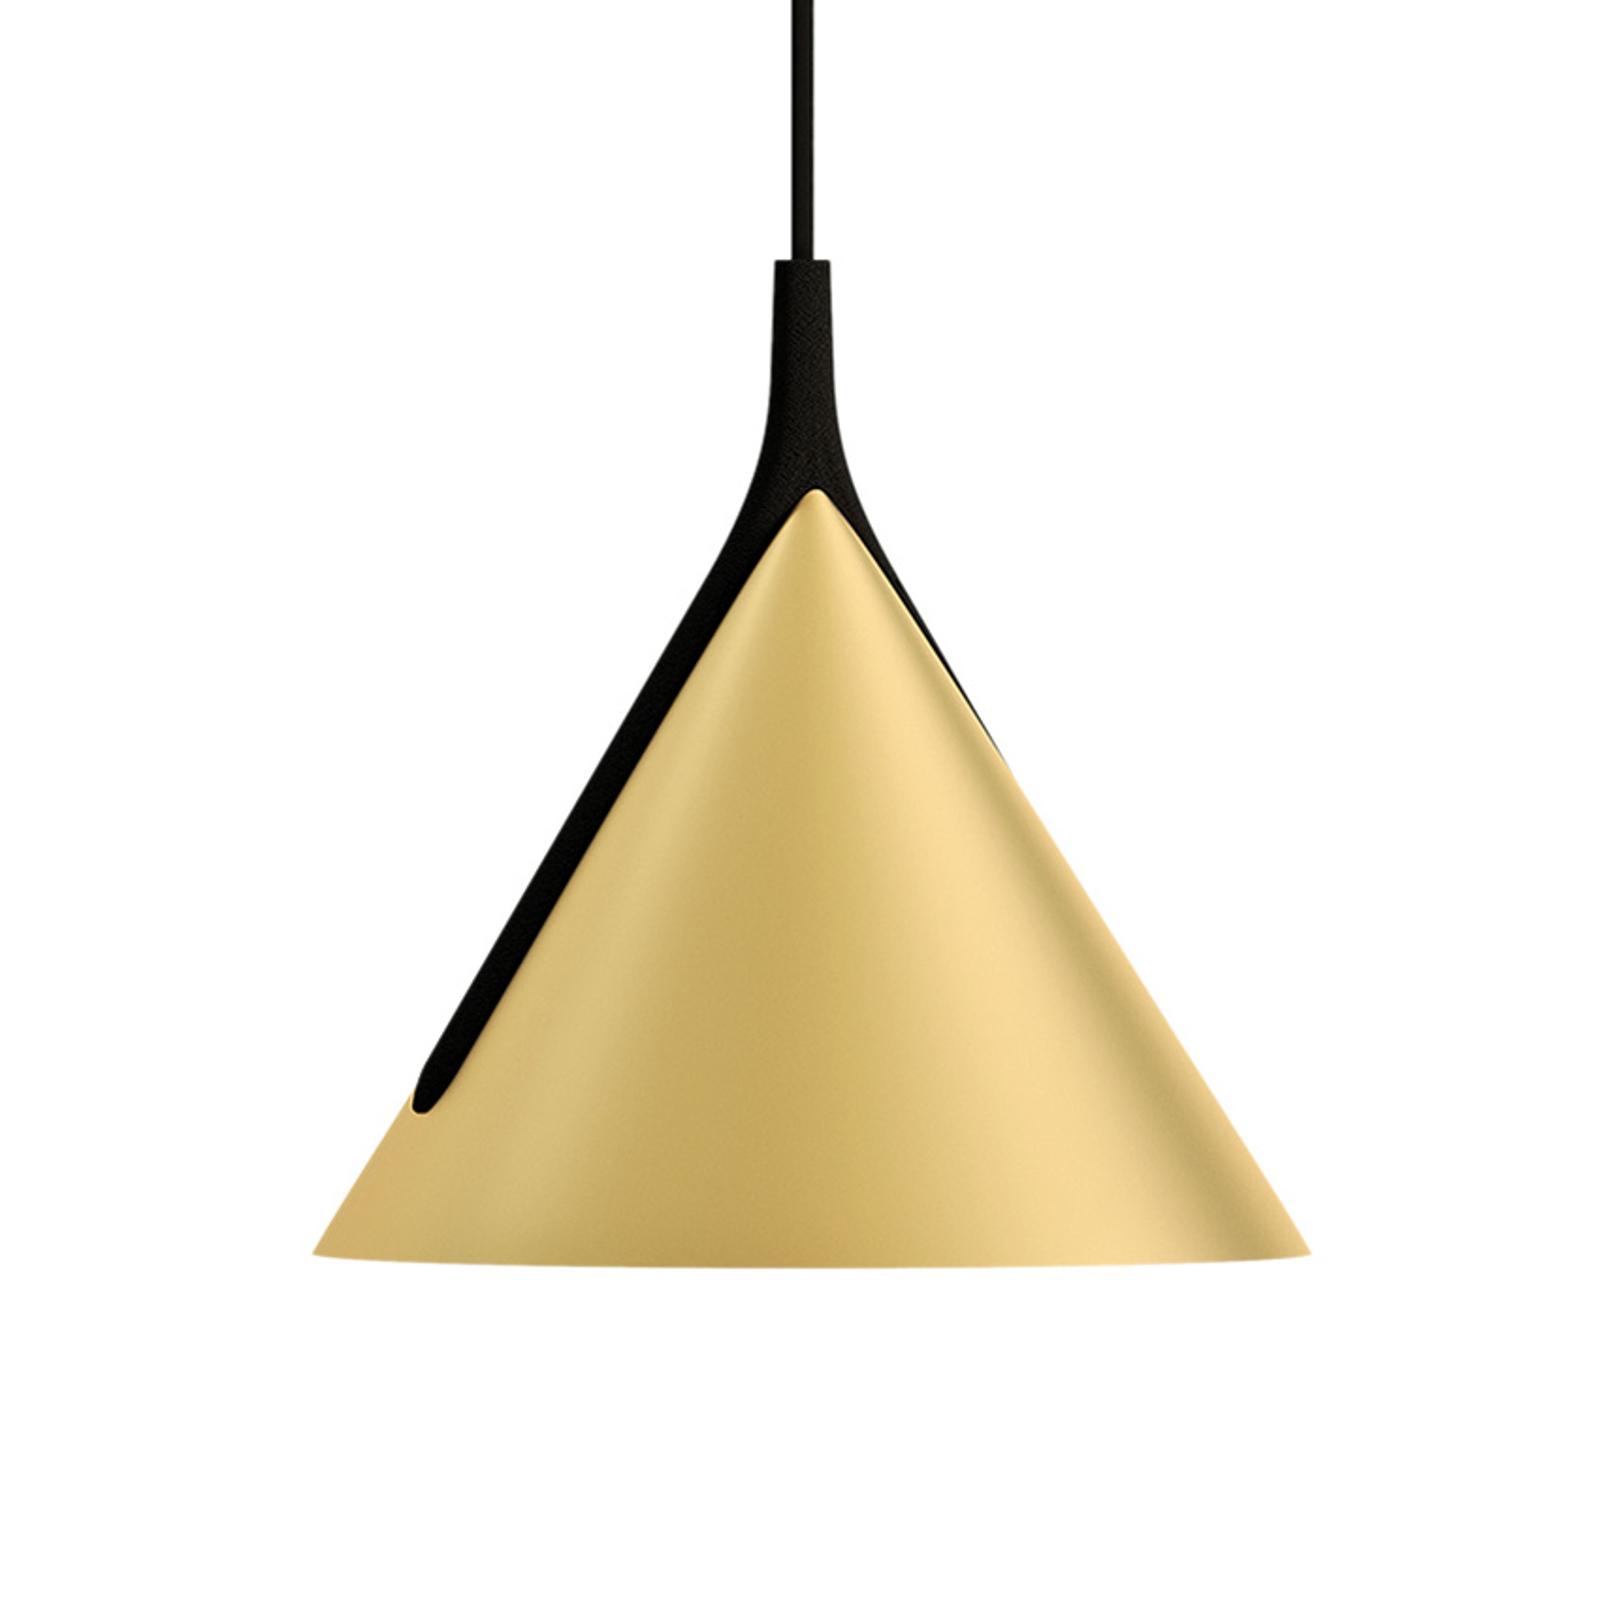 Axolight Jewel Mono Pendel schwarz-gold 2700K 12°